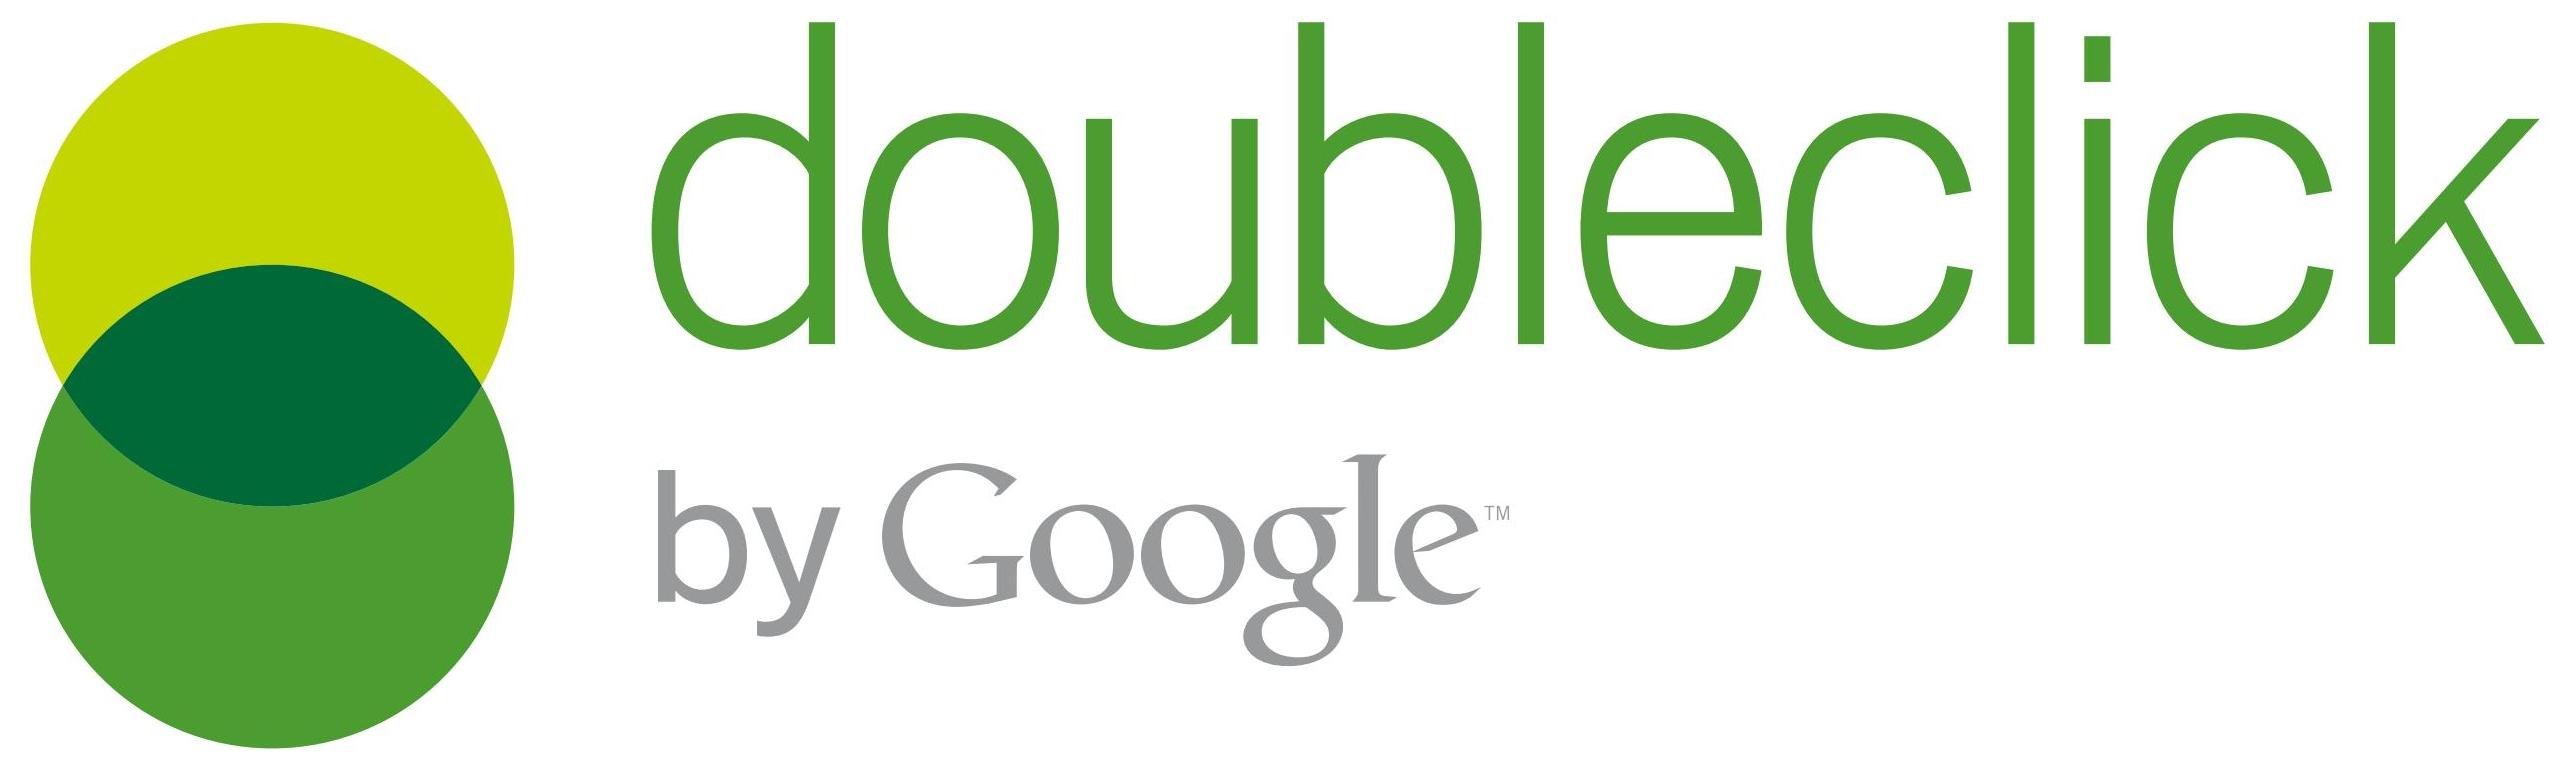 case studies on google inc